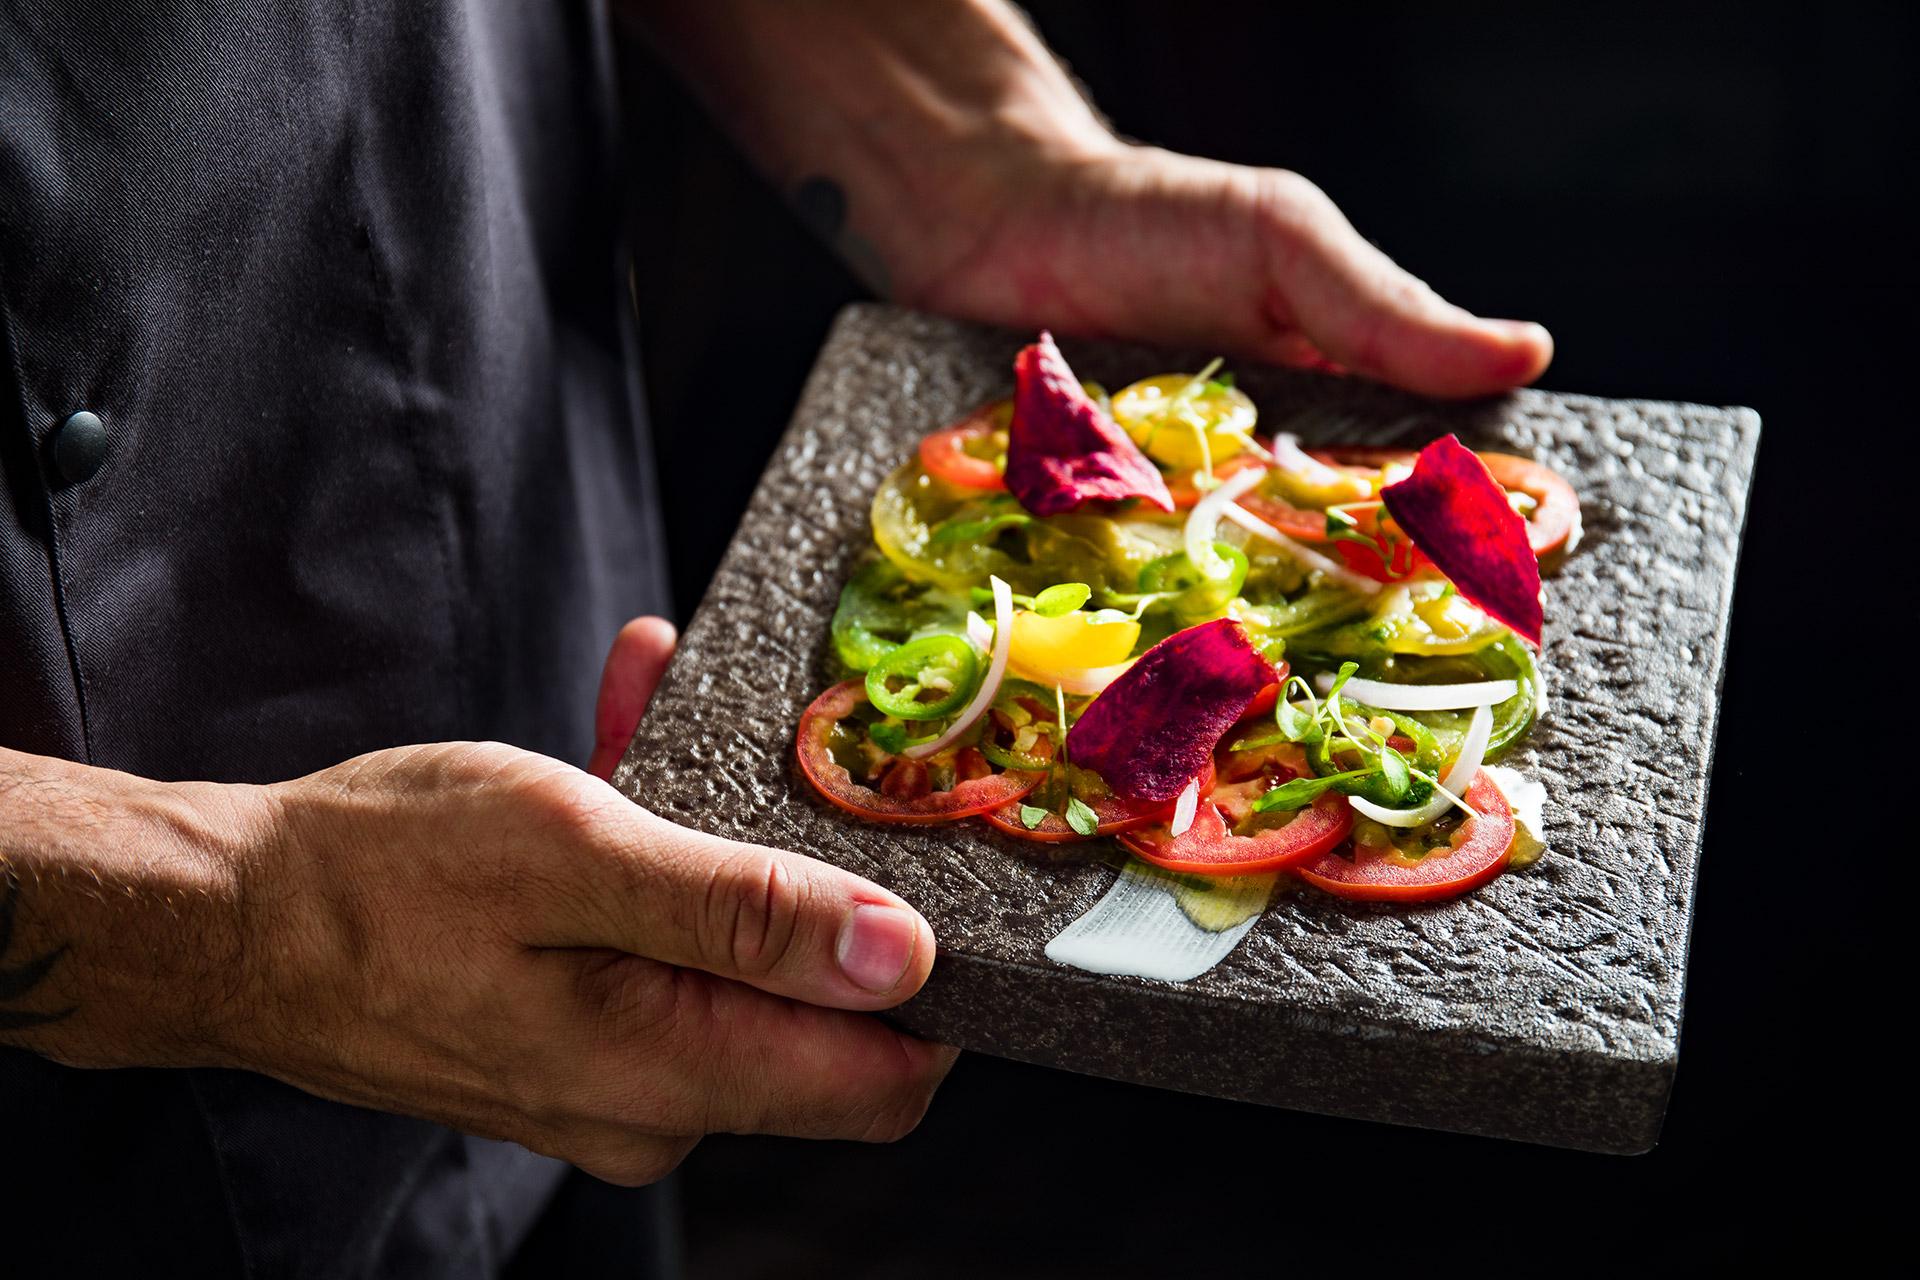 Nikkei-Salad-KOKO.jpg